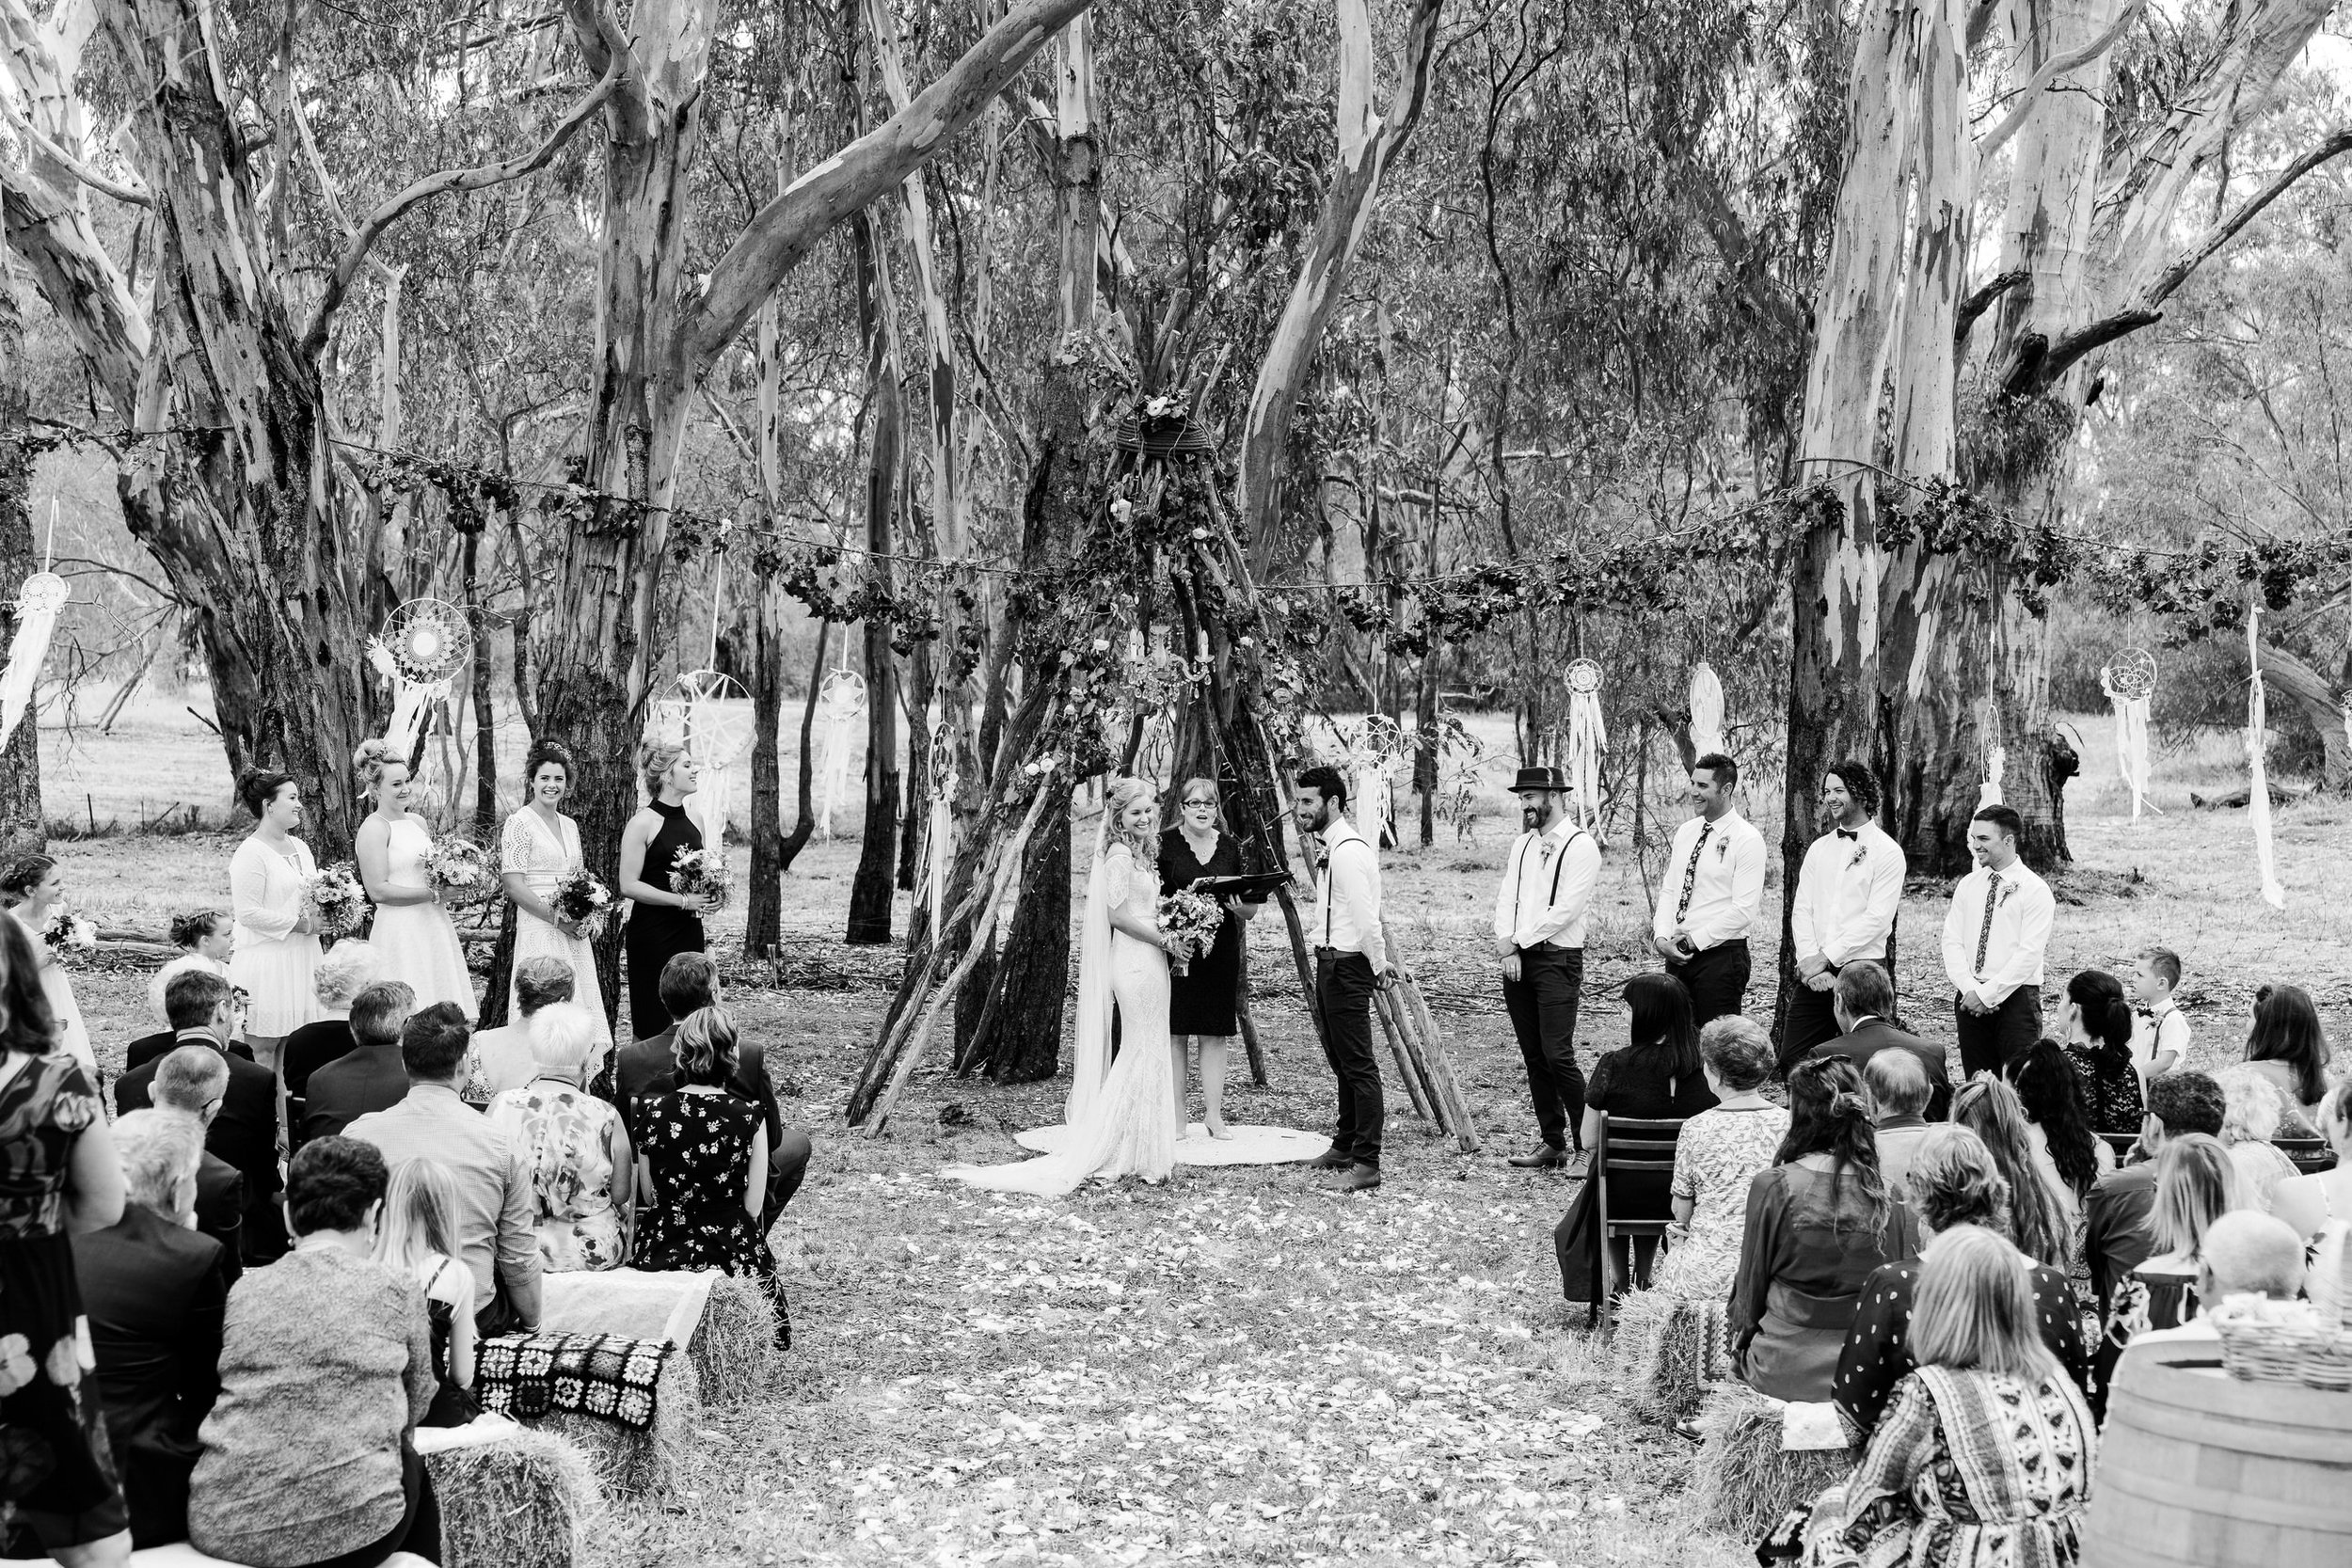 Justin_And_Jim_Photography_Backyard_Wedding174.JPG